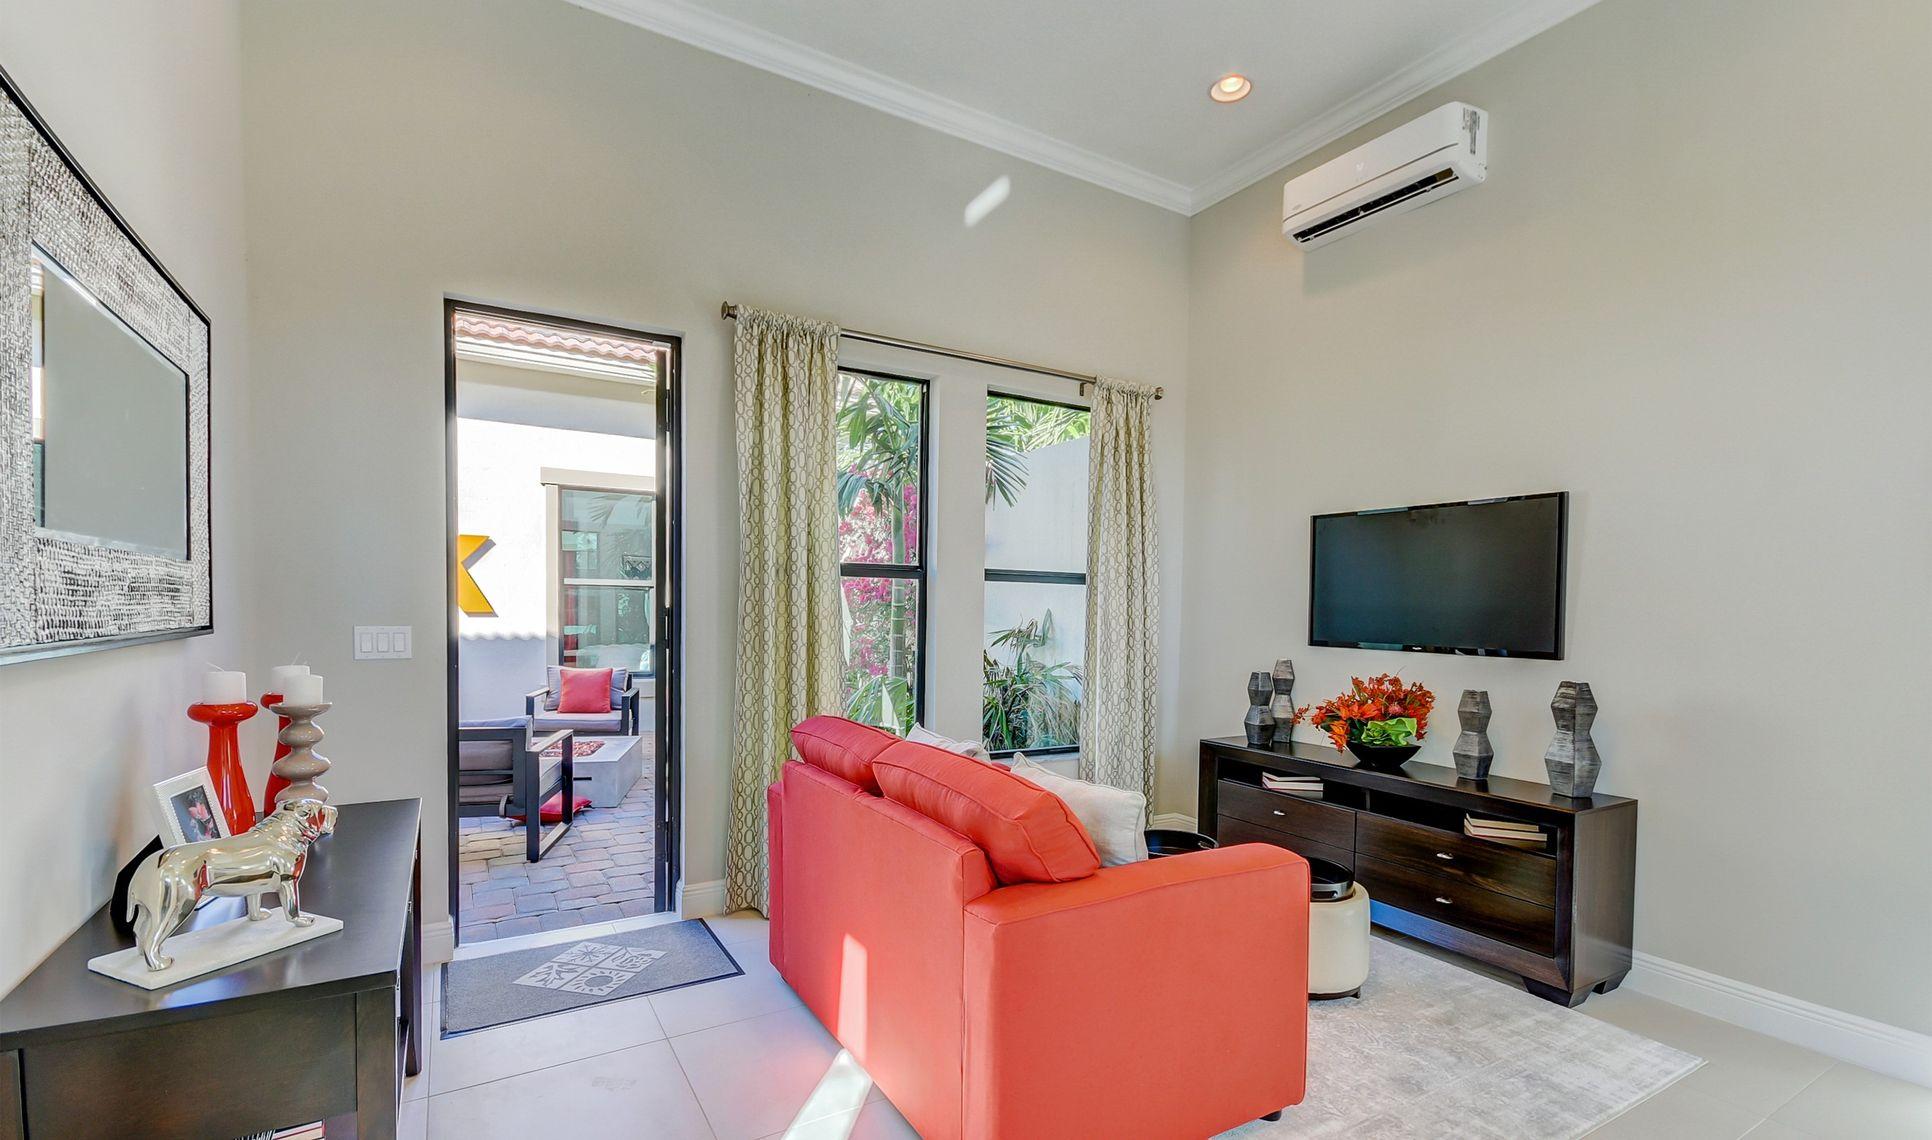 Interior:Cozy casita for overnight guests